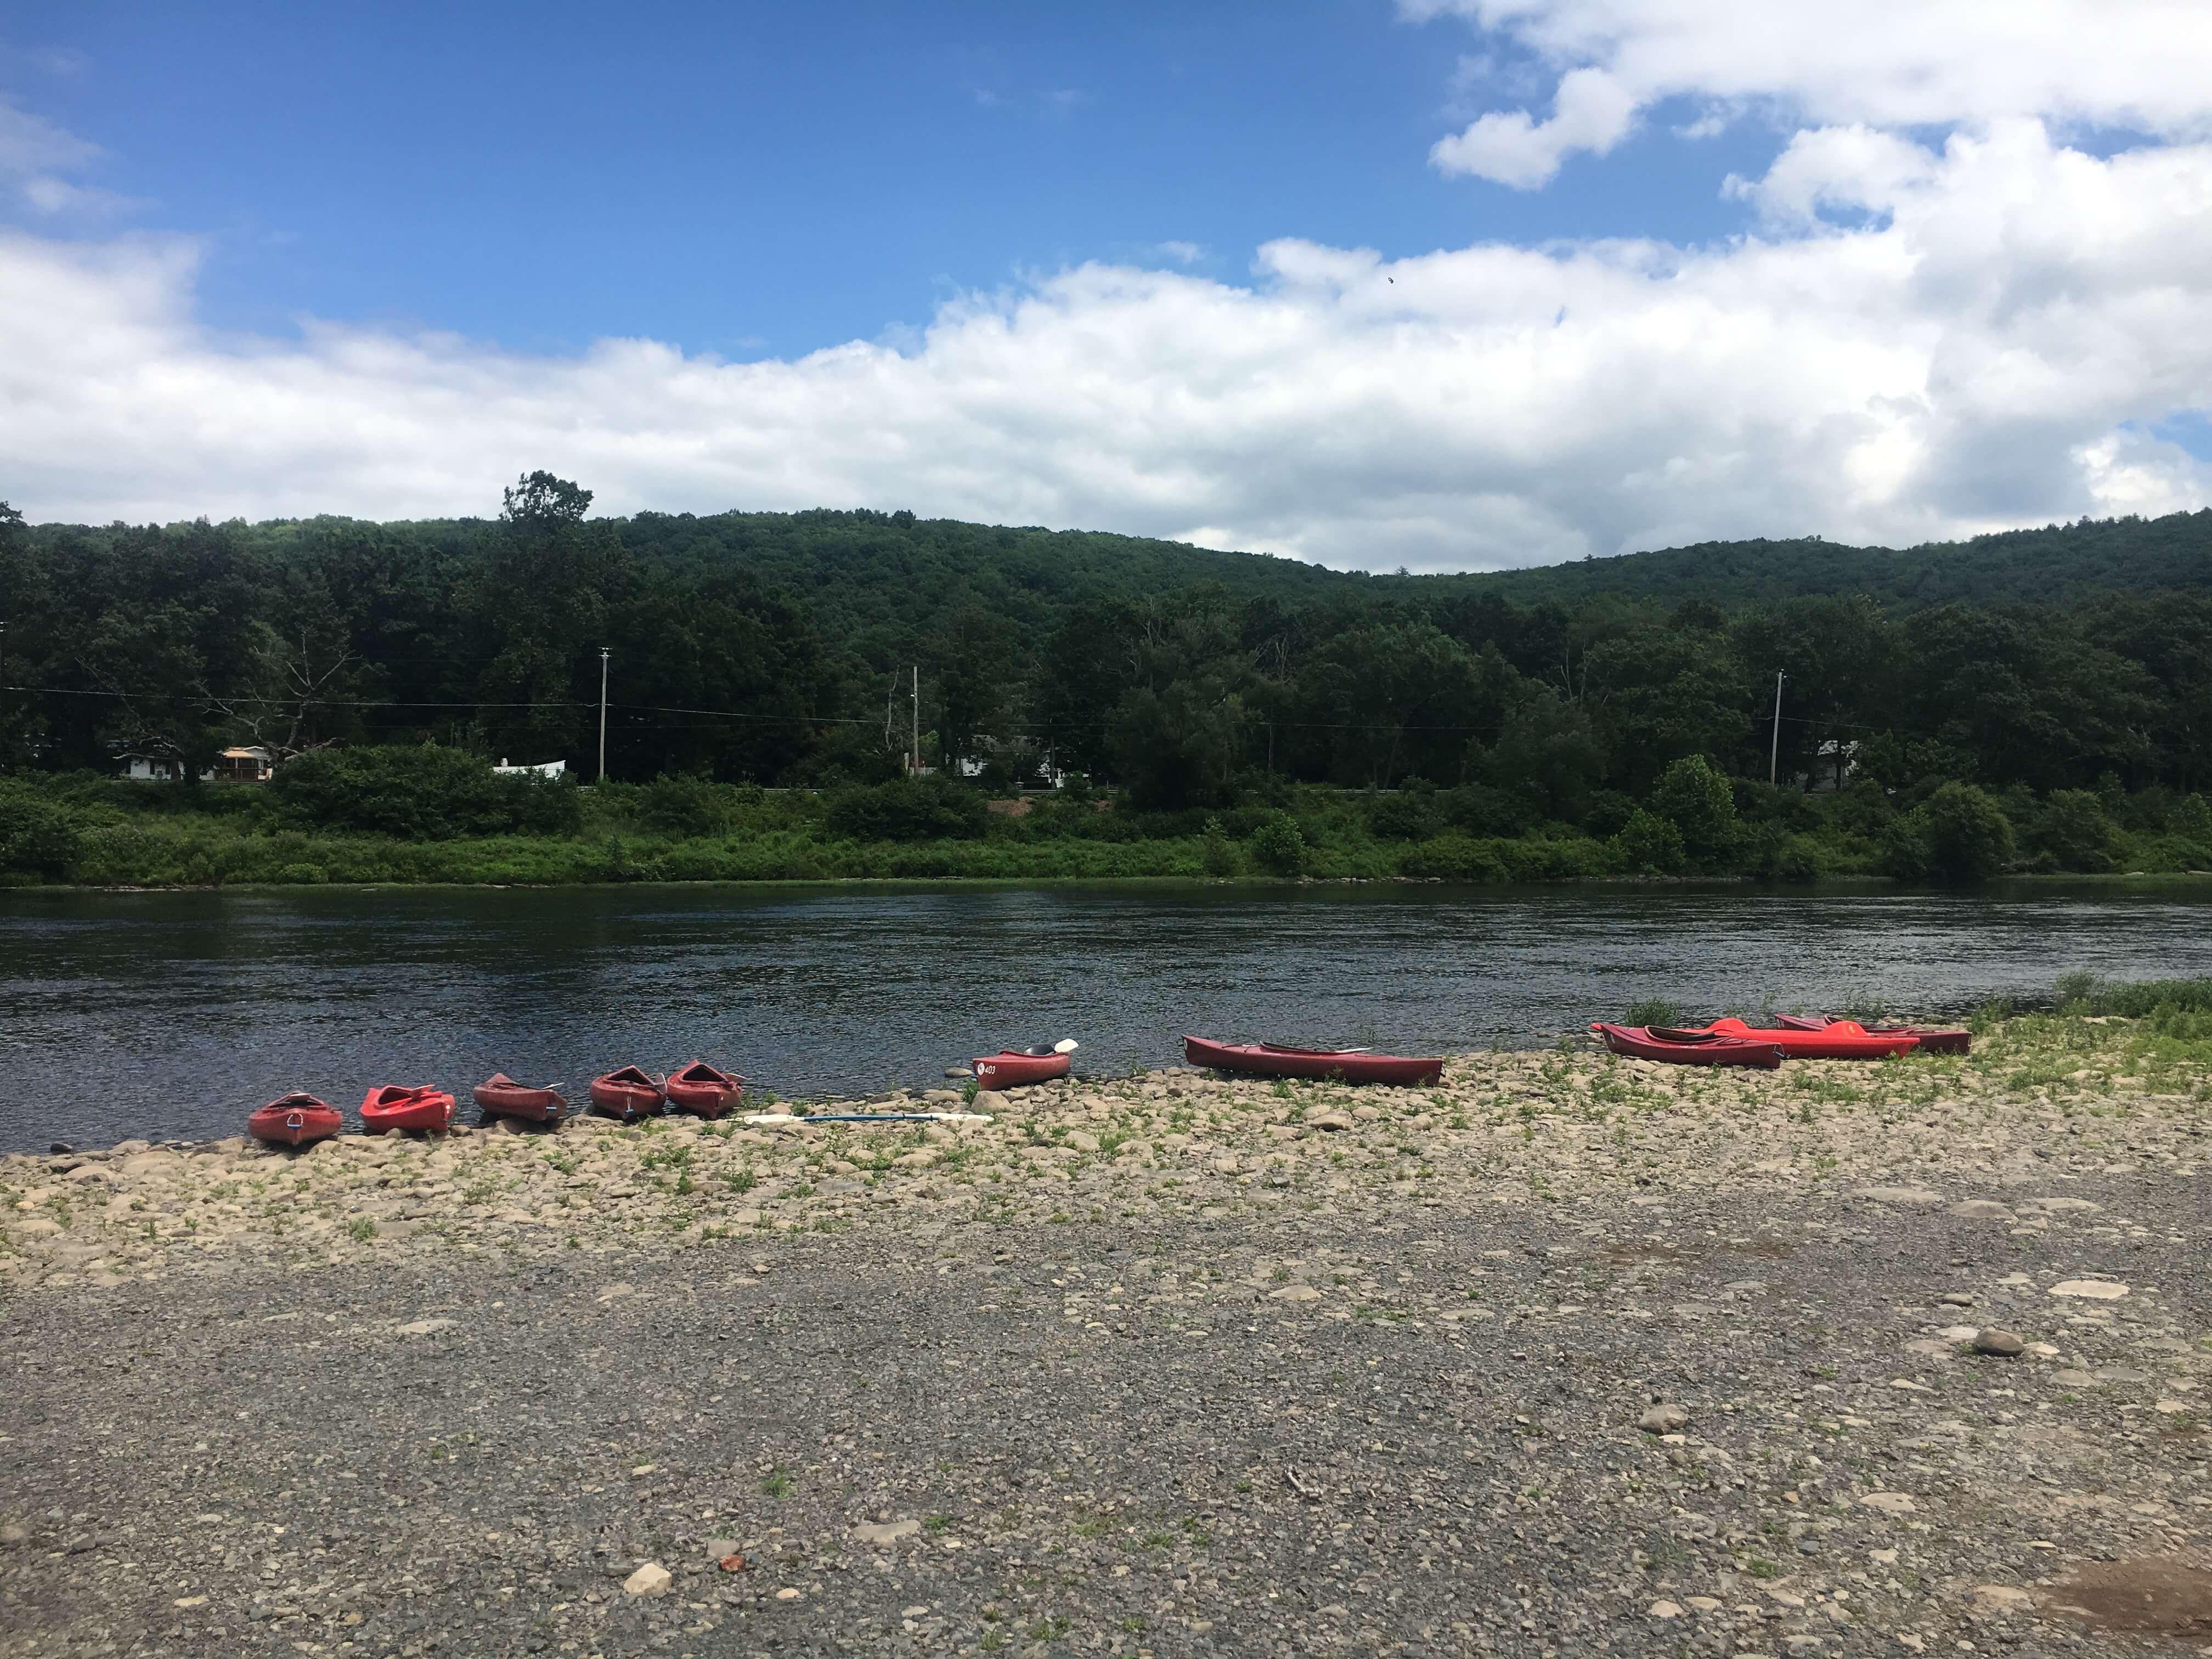 day trip idea from NY kayaking trip